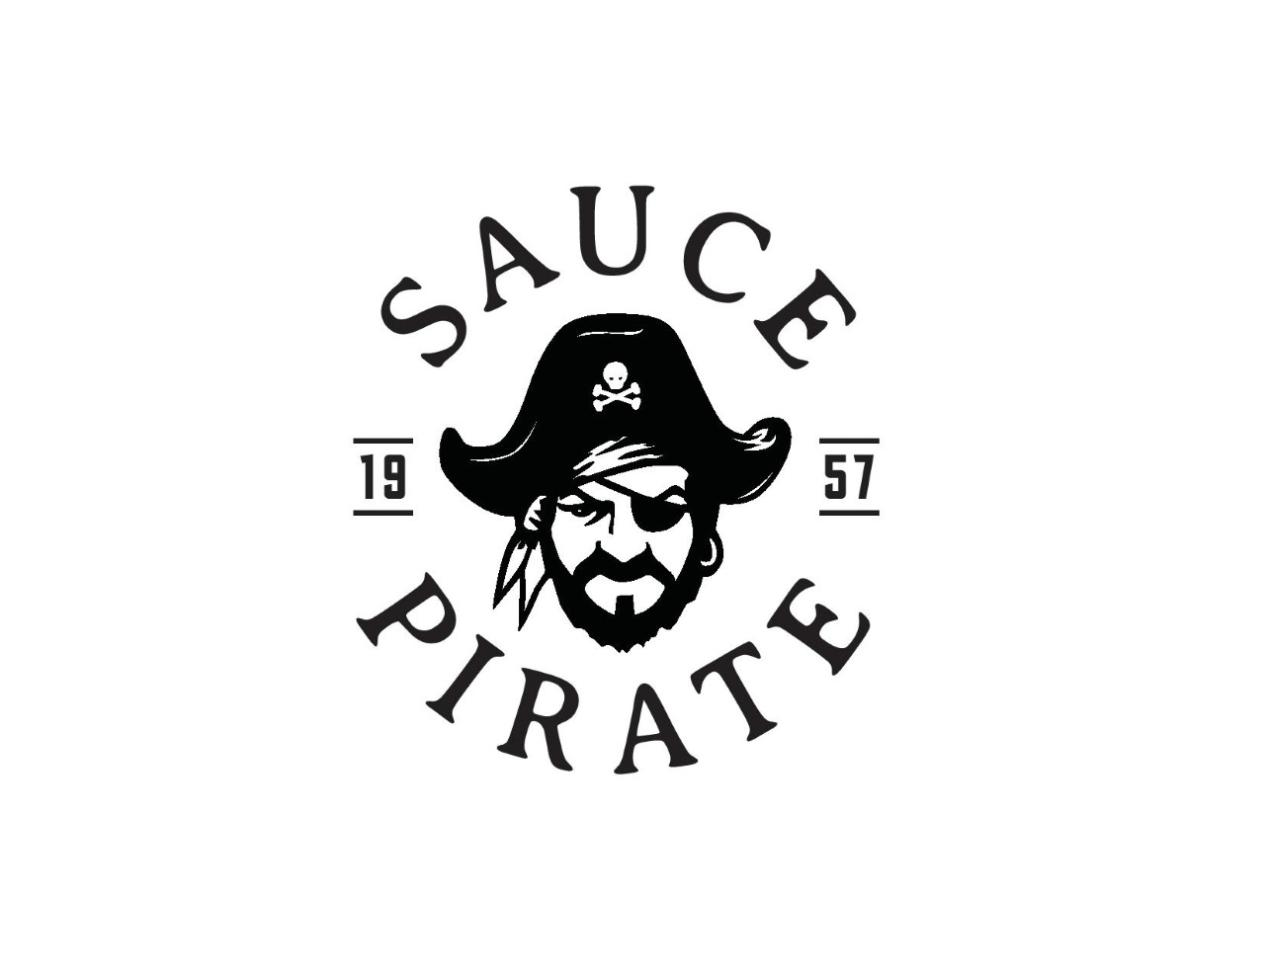 Sauce Pirate